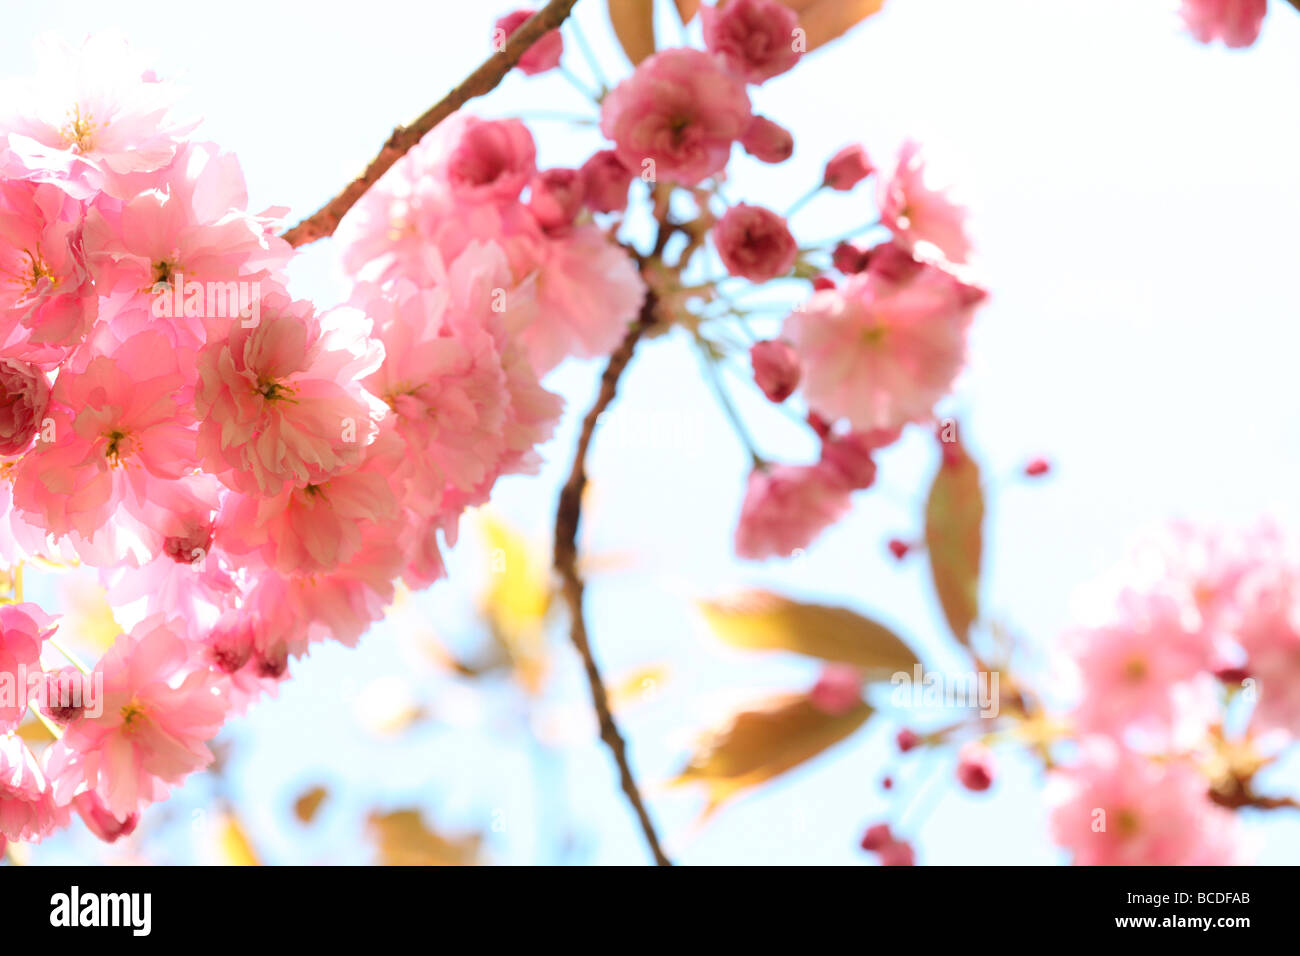 Un goût de printemps prunus cherry blossom fine art photography Photographie Jane Ann Butler JABP456 Photo Stock